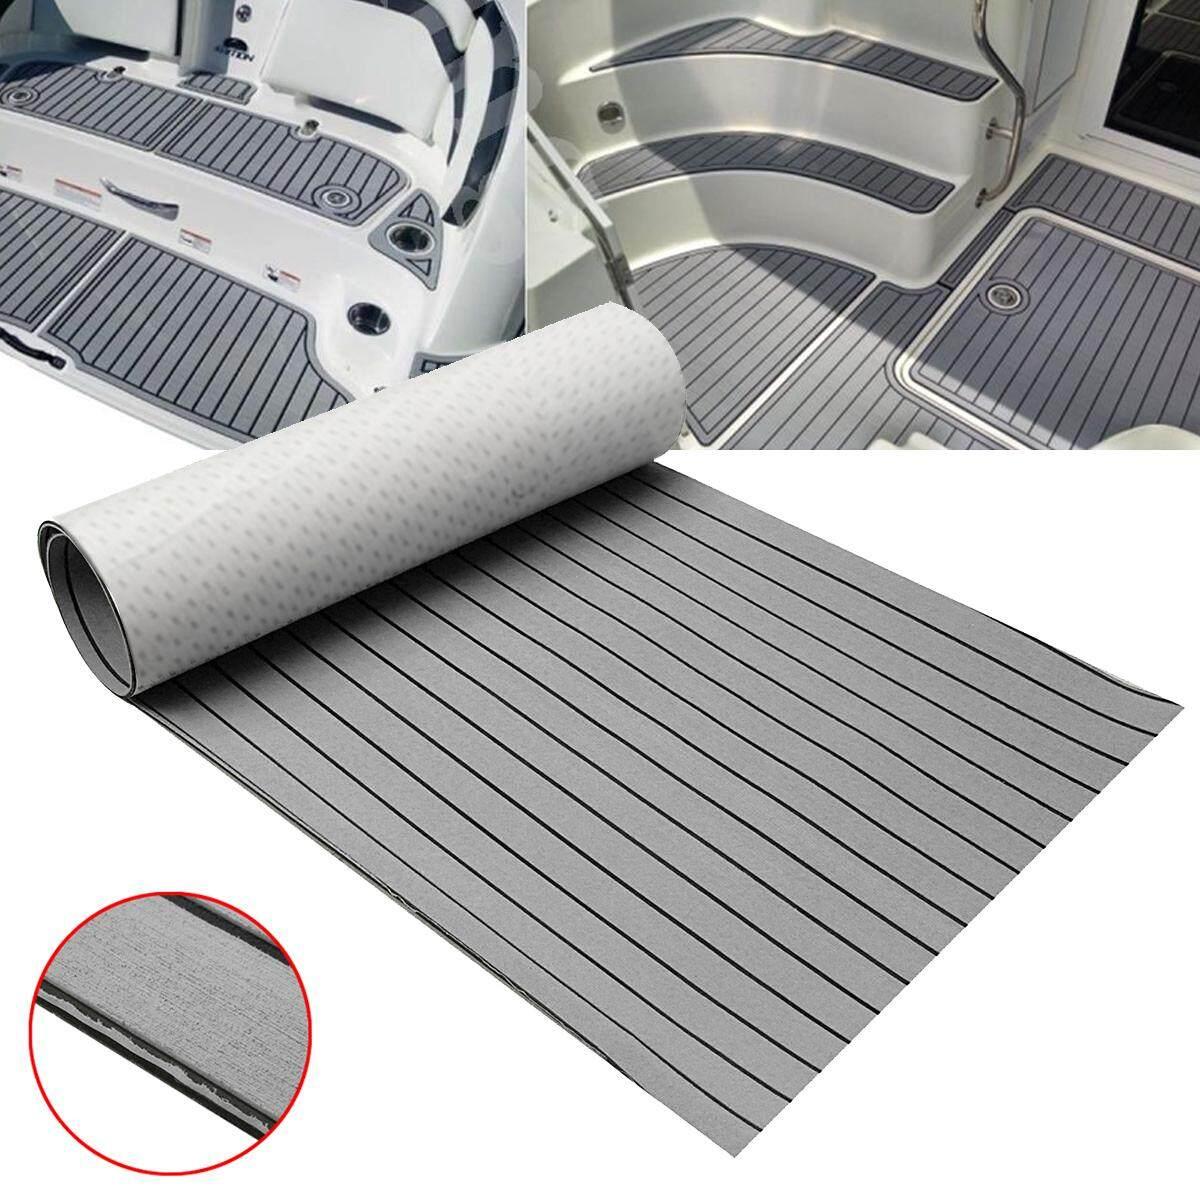 900x2300x6mm Marine Boat Flooring EVA Foam Teak Decking Sheet Floor Mat Pad Self-Adhesive